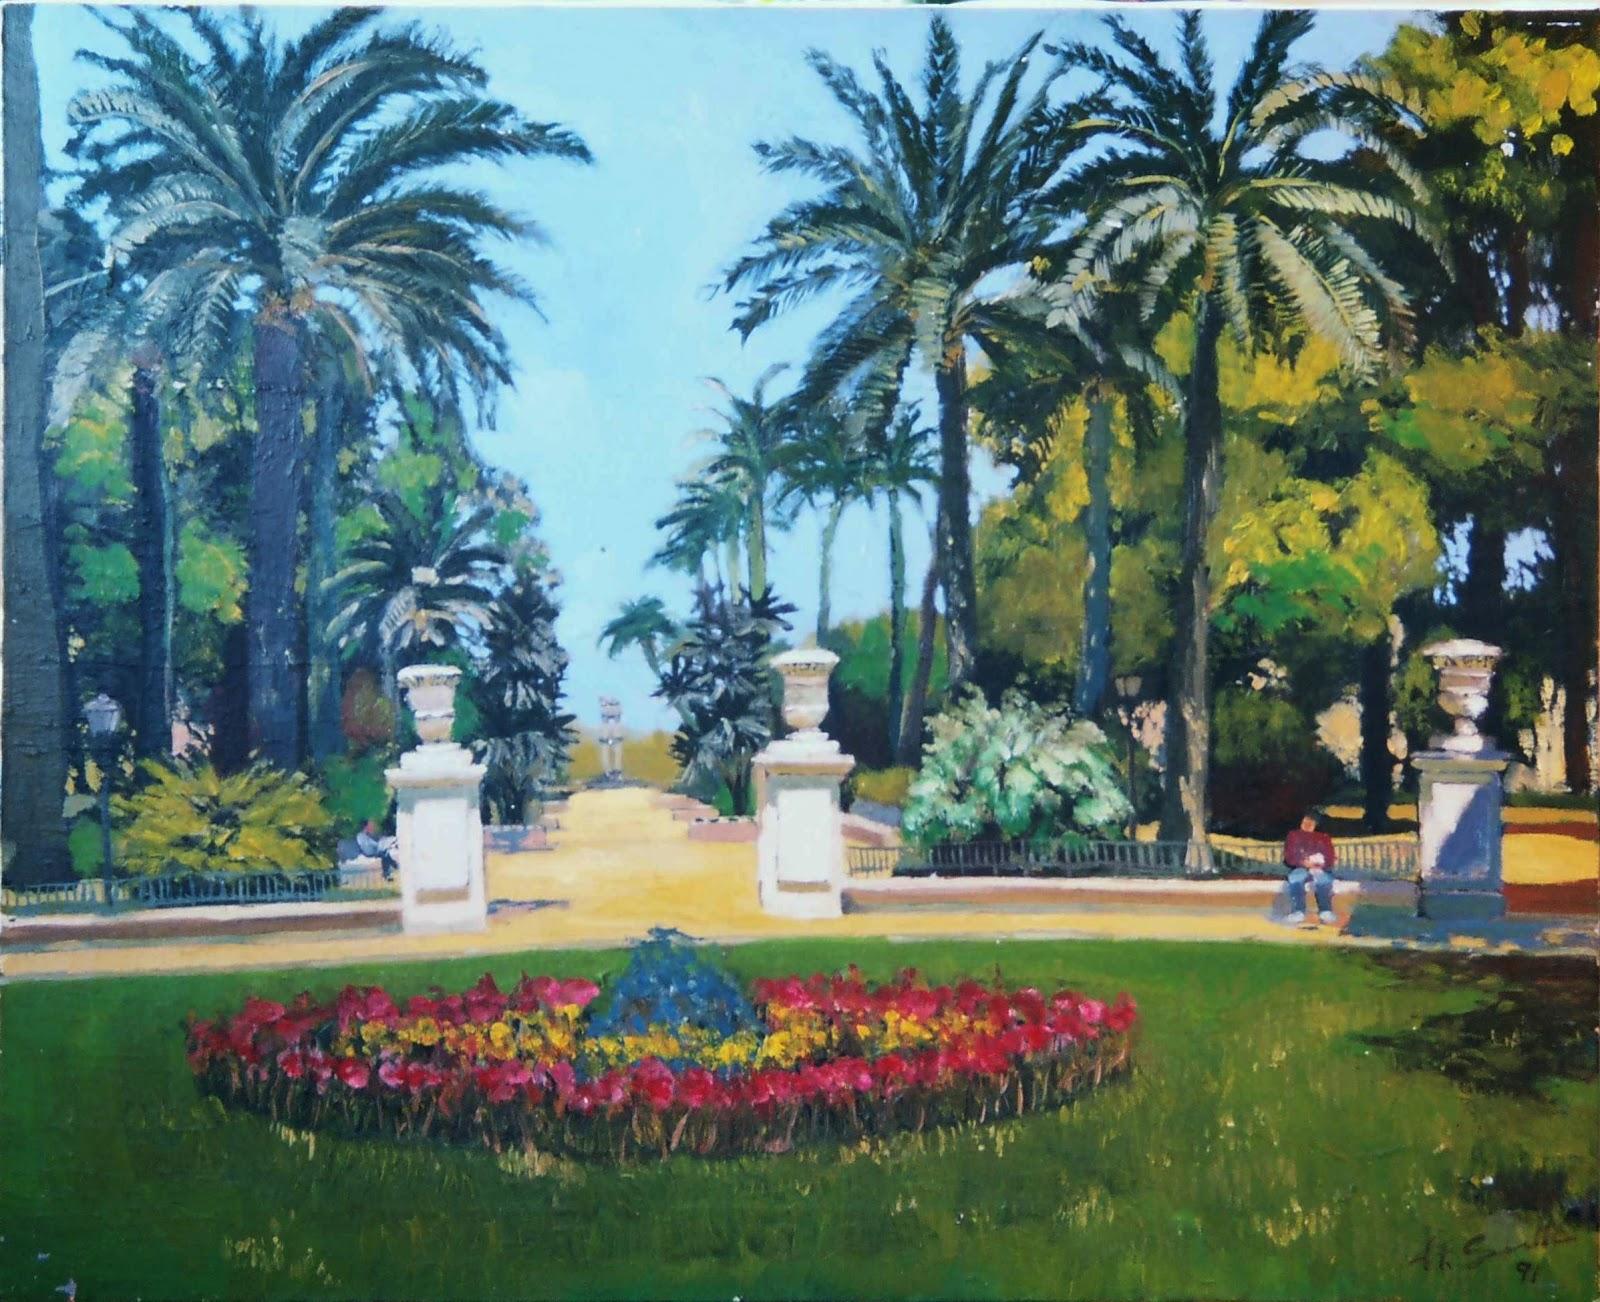 Papel y lienzo jardines de murillo 1991 for Jardines de murillo